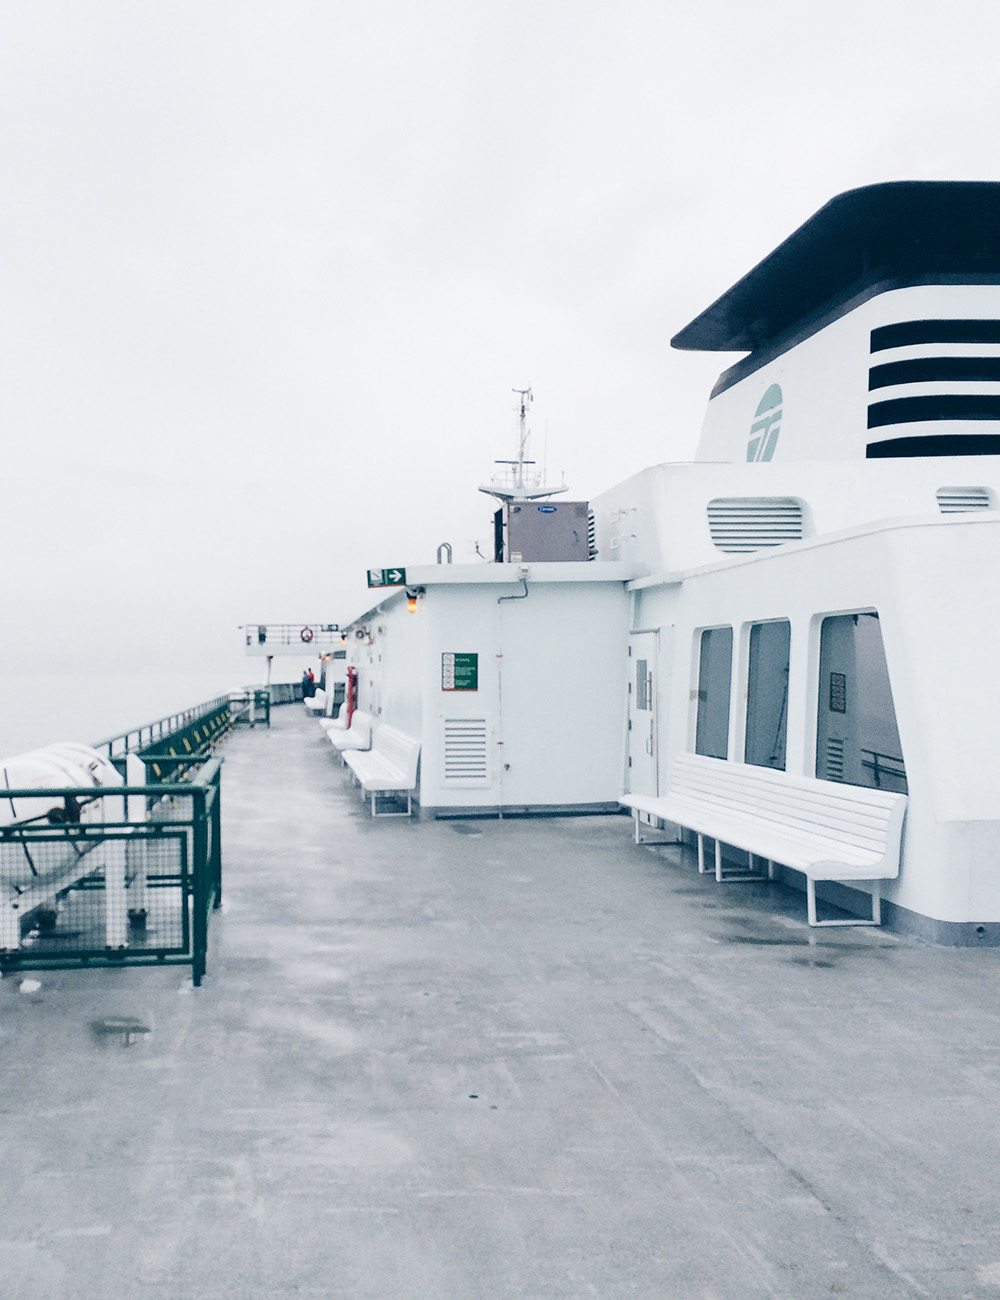 ferry-tall